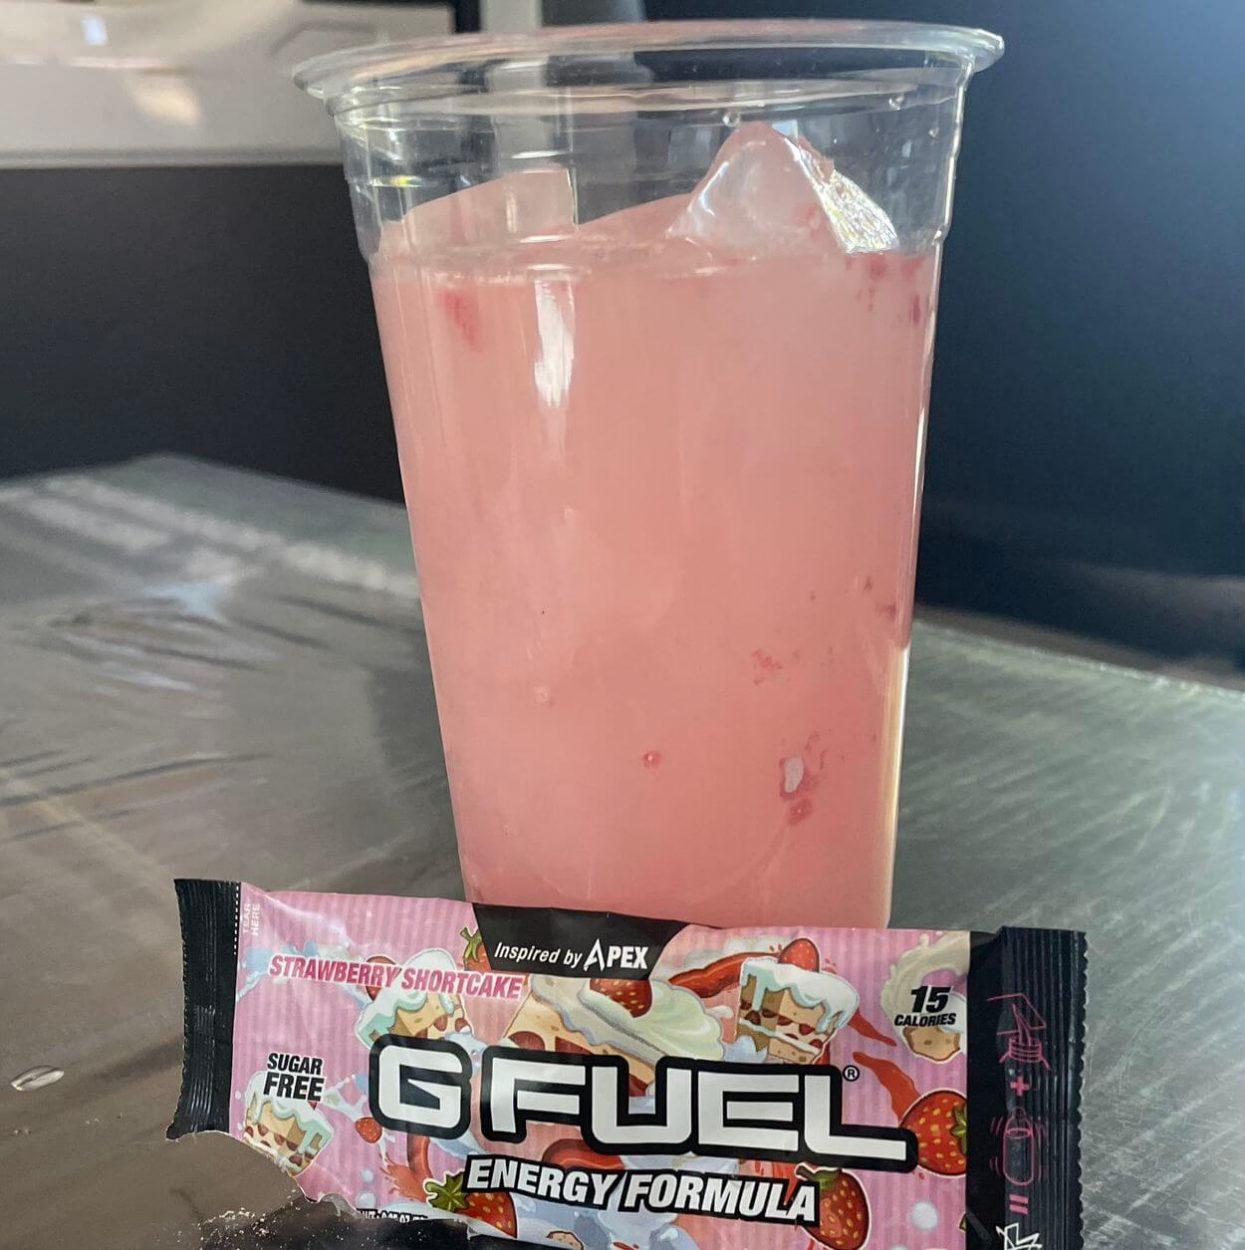 Strawberry Shortcake flavored G Fuel